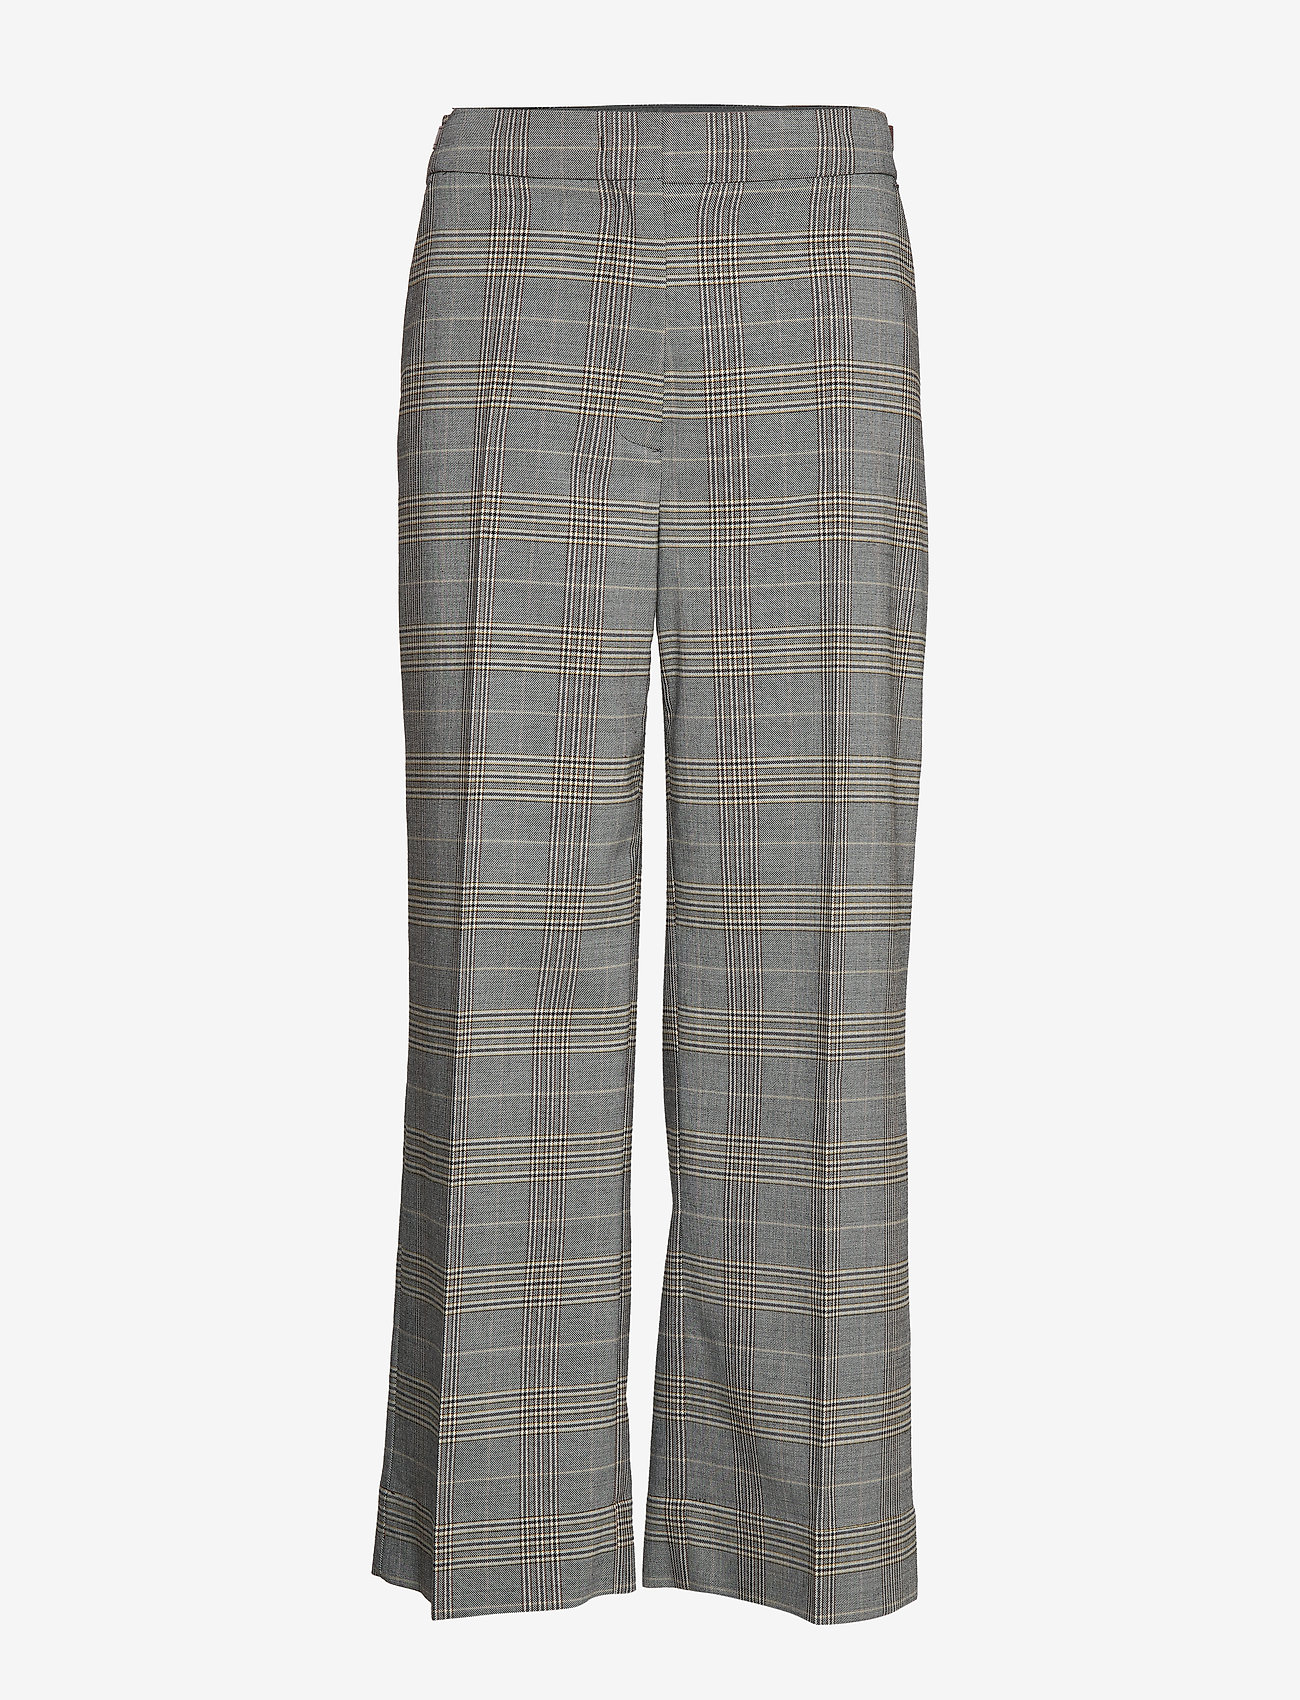 Sportmax Code - ANDREIS - leveälahkeiset housut - medium grey